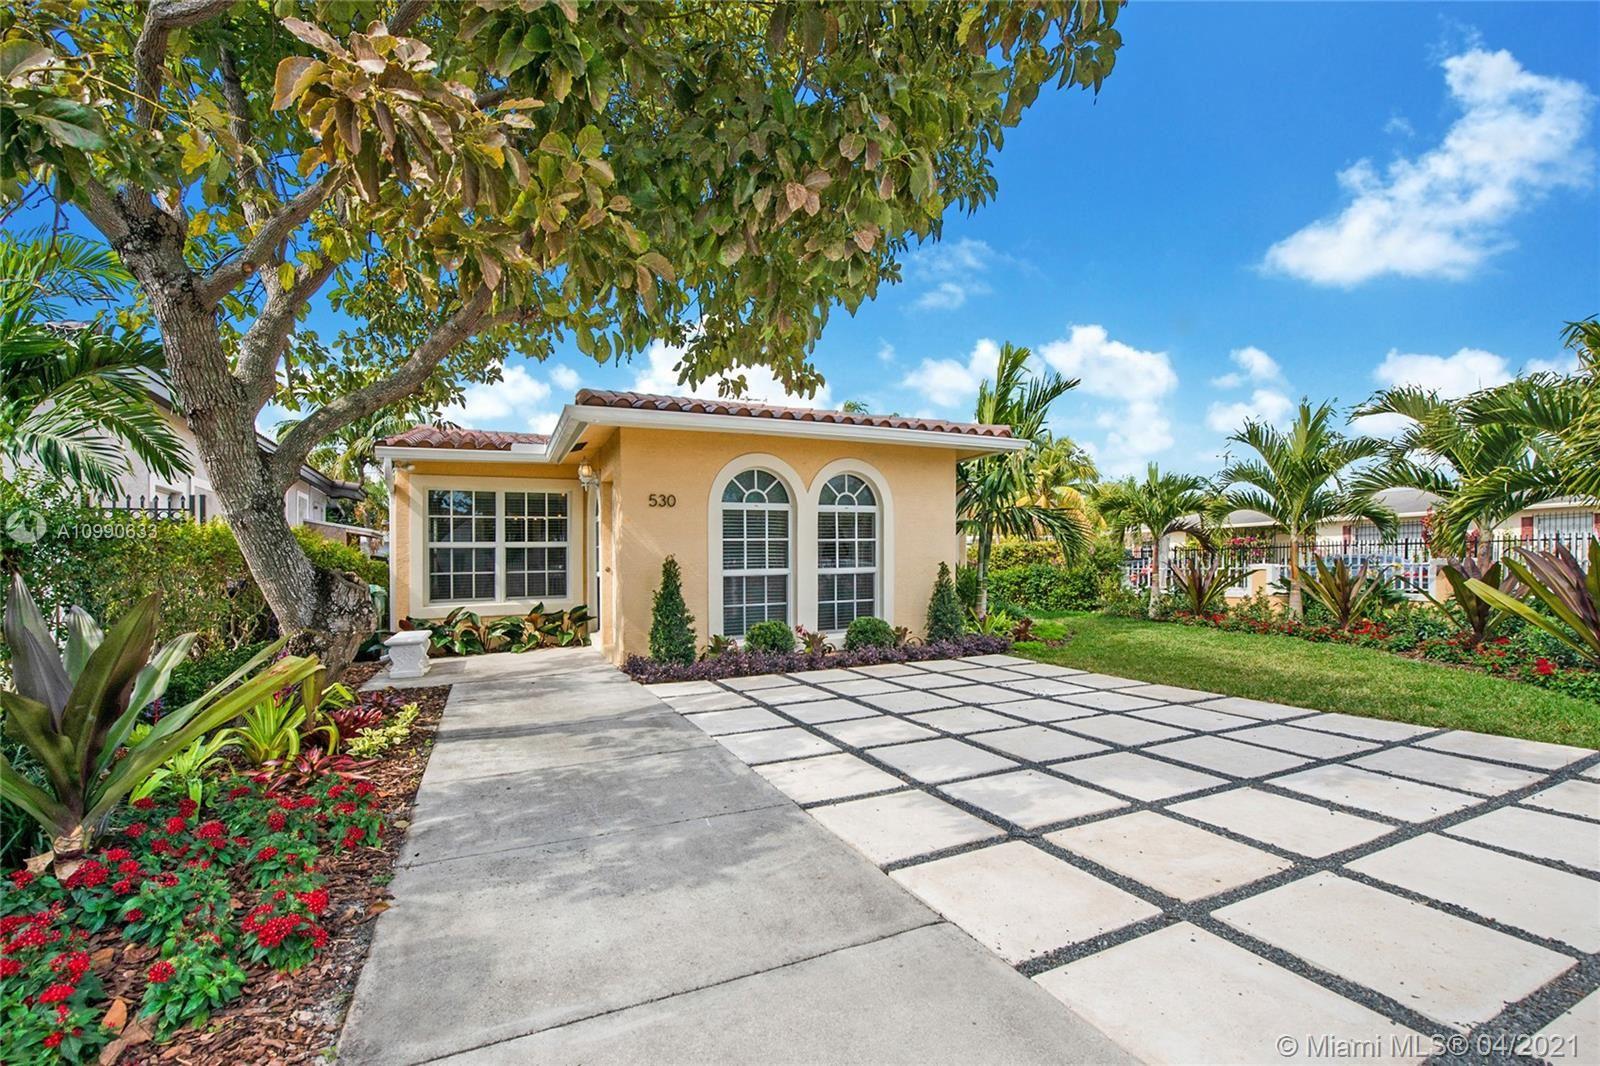 530 NW 31st Ave, Miami, FL 33125 - #: A10990633